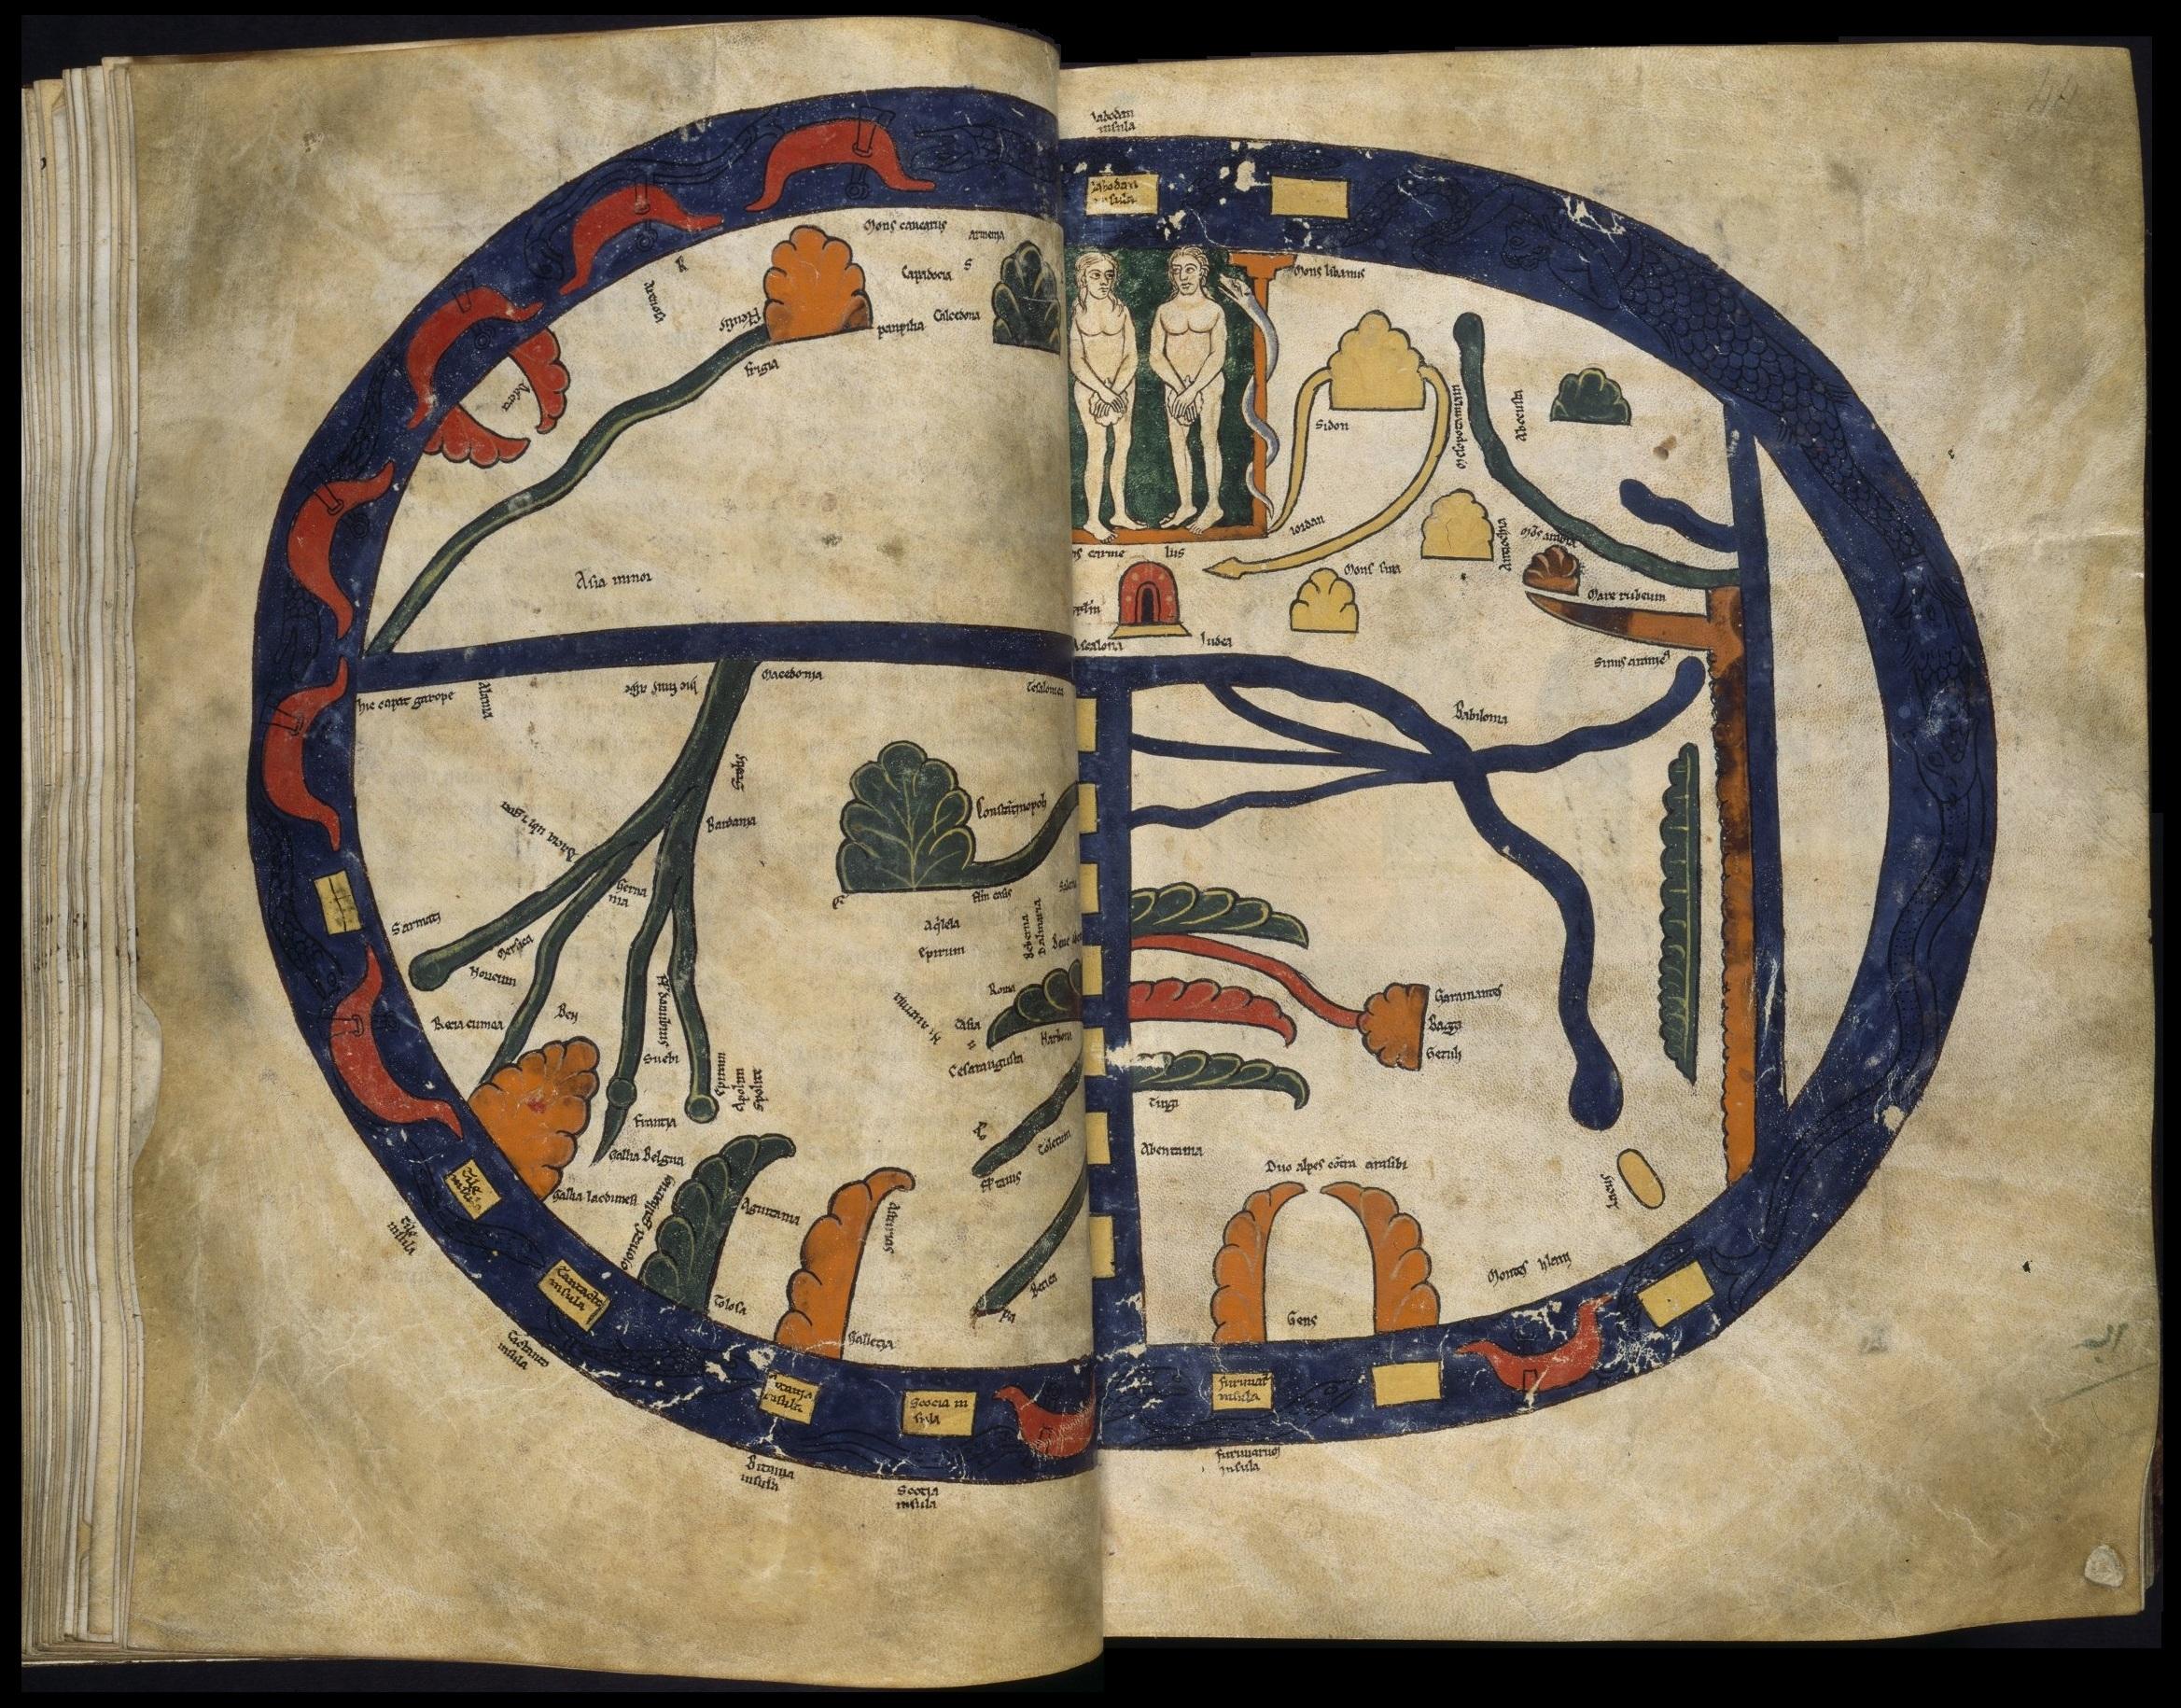 The Manchester (a.k.a. Altamira) Beatus mappamundi, ca. 1175, John Rylands Library, MS. Lat. 8, fols. 43v-44, Manchester, England